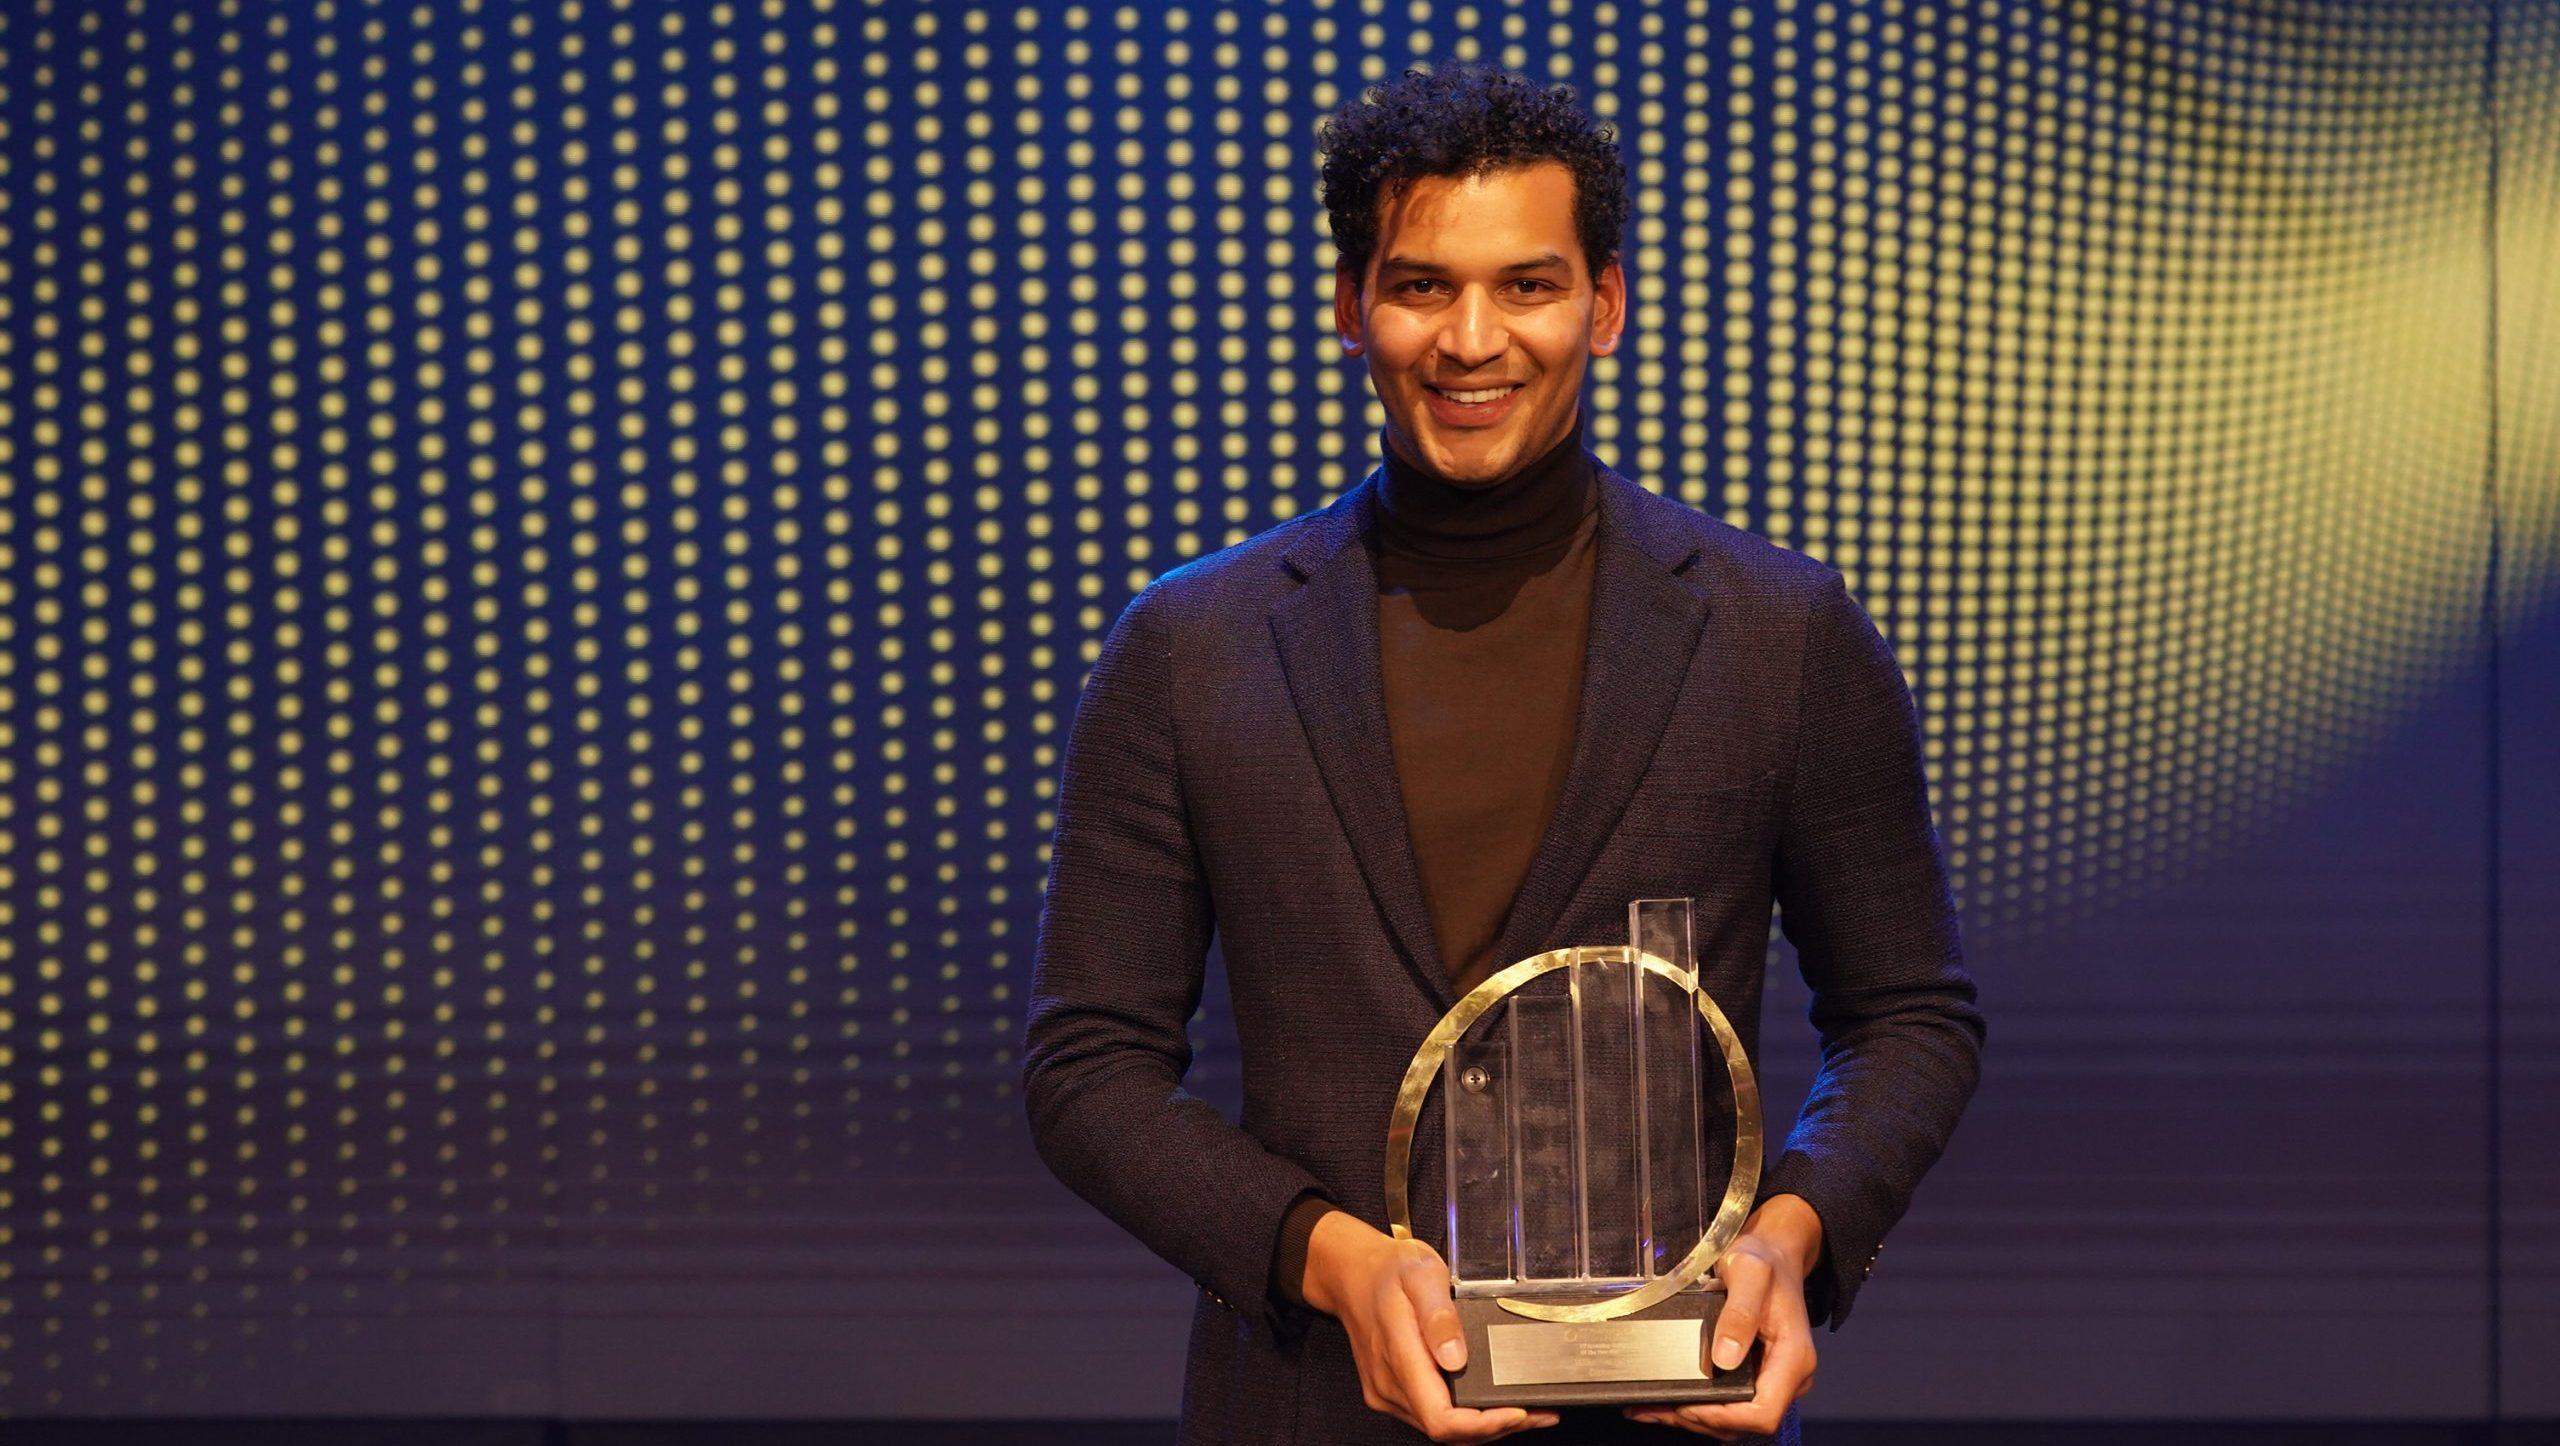 Milan Daniels ceo oprichter Otrium EY Entrepreneur of the Year Emerging categorie